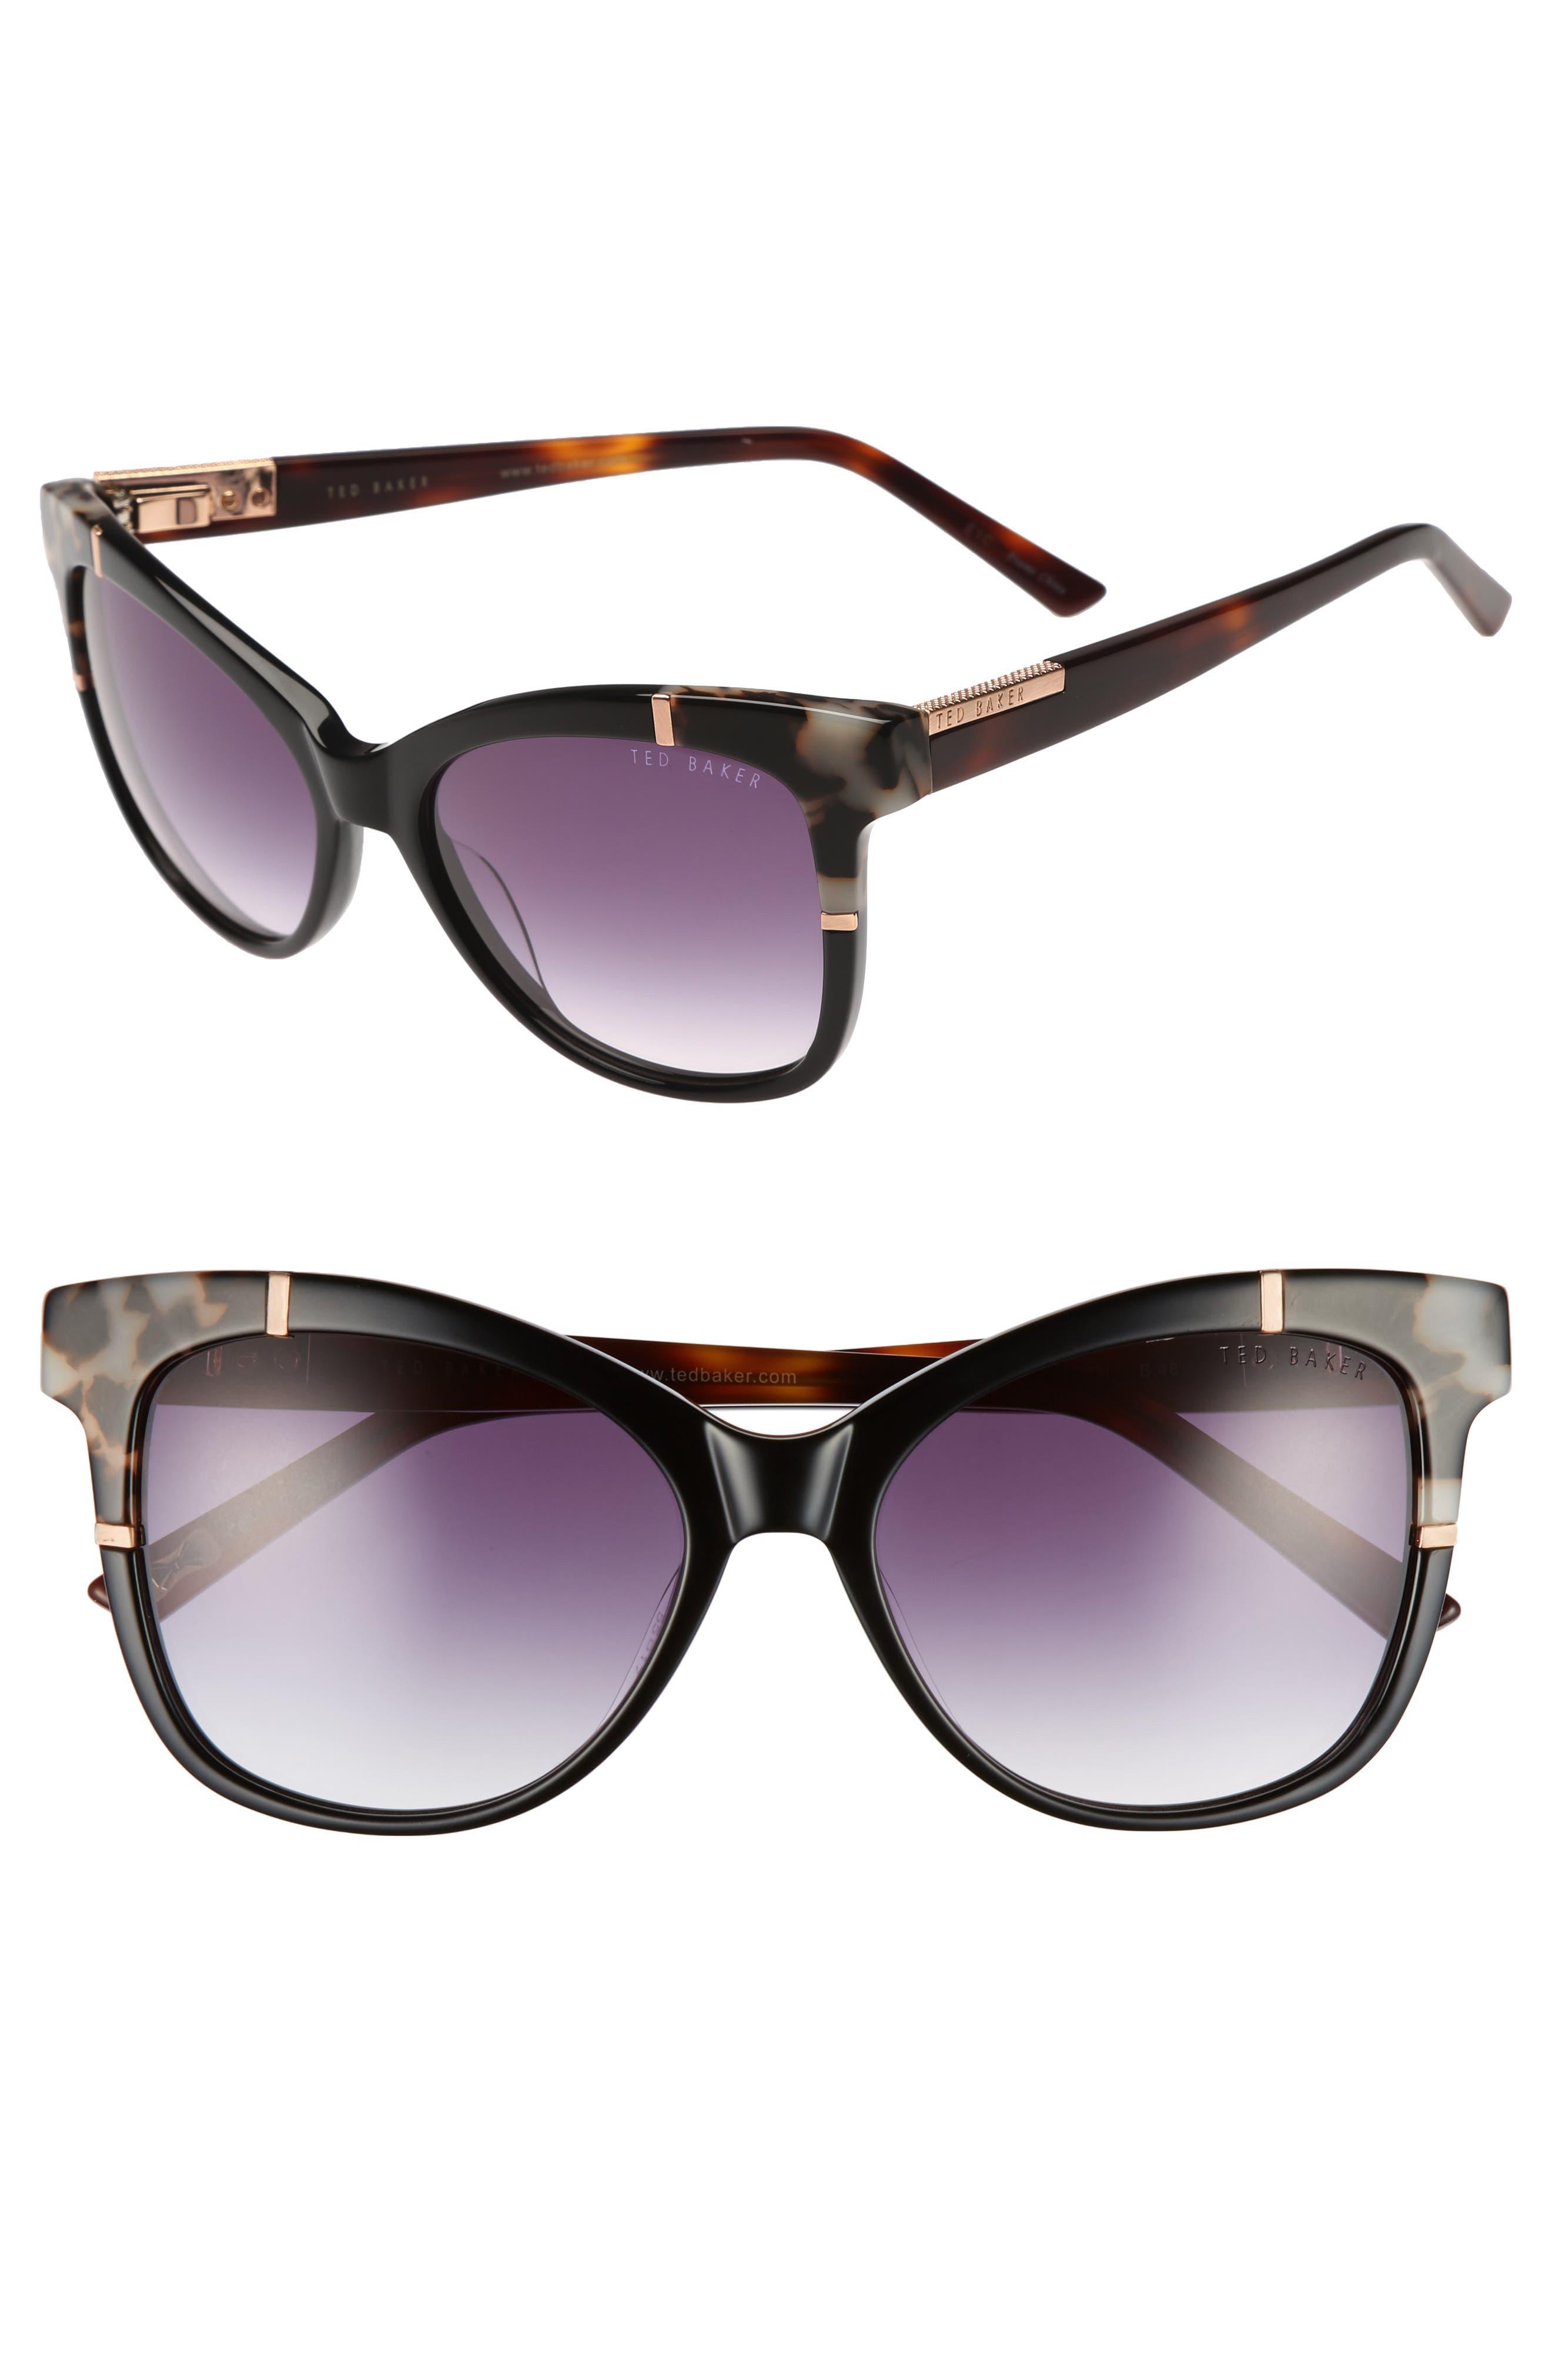 55mm Square Cat Eye Sunglasses,                         Main,                         color, 001